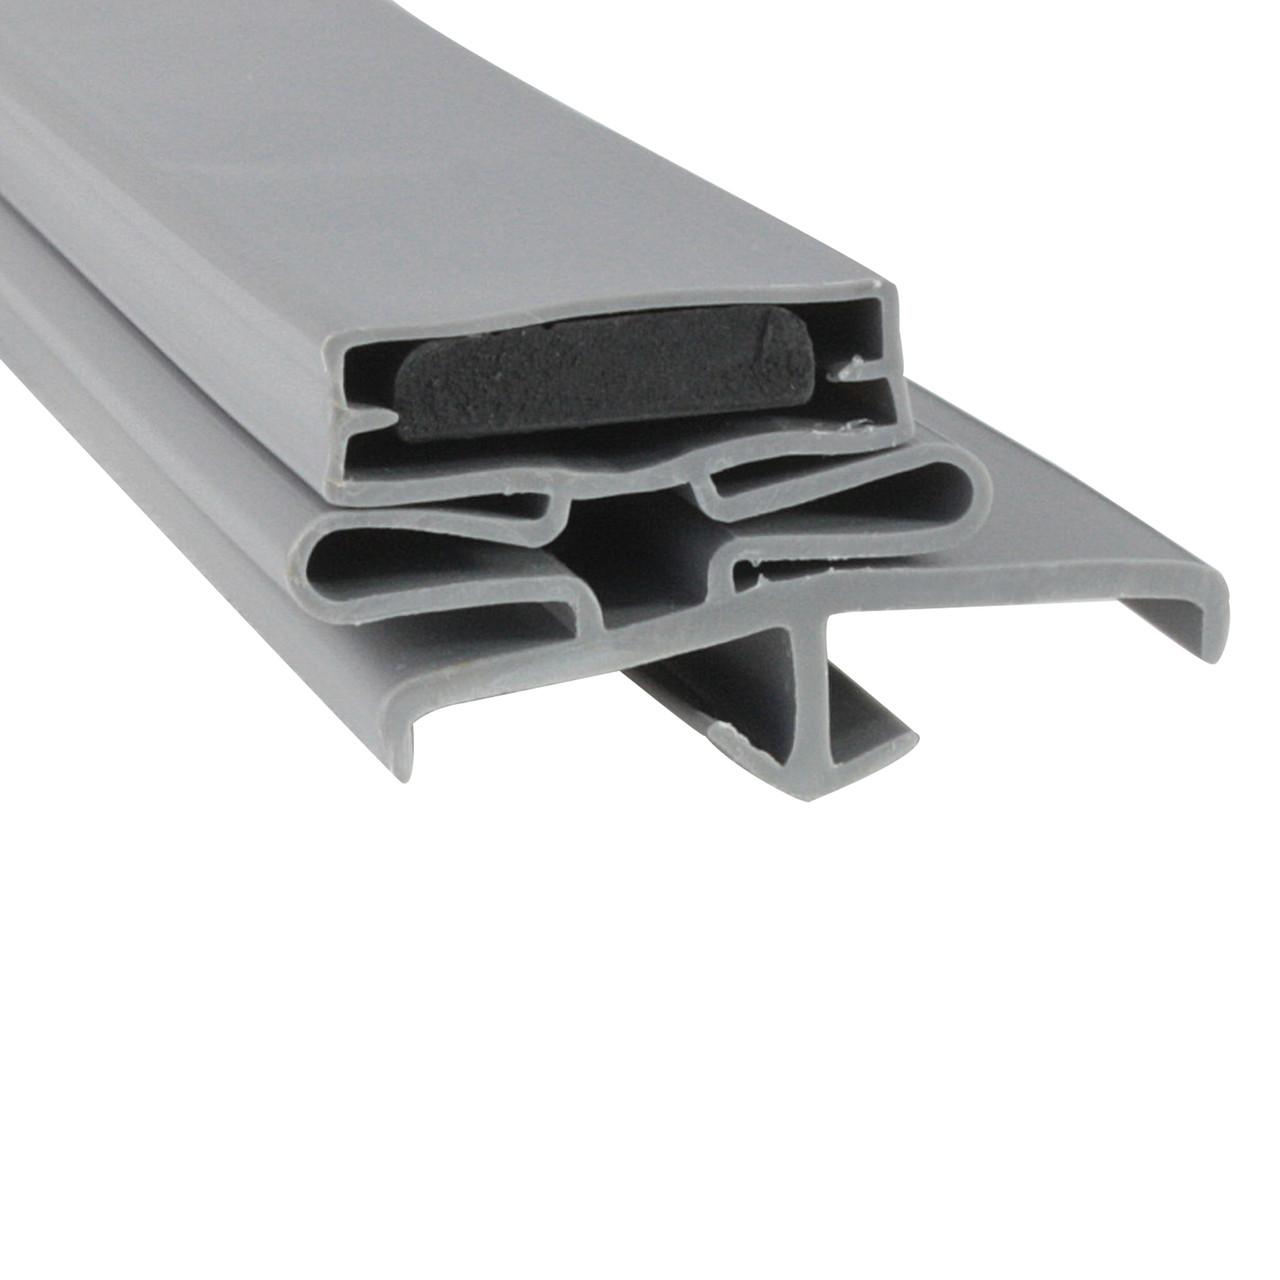 Delfield Door Gasket Profile 168 24 1/2 x 29 1/4 -A2.0901